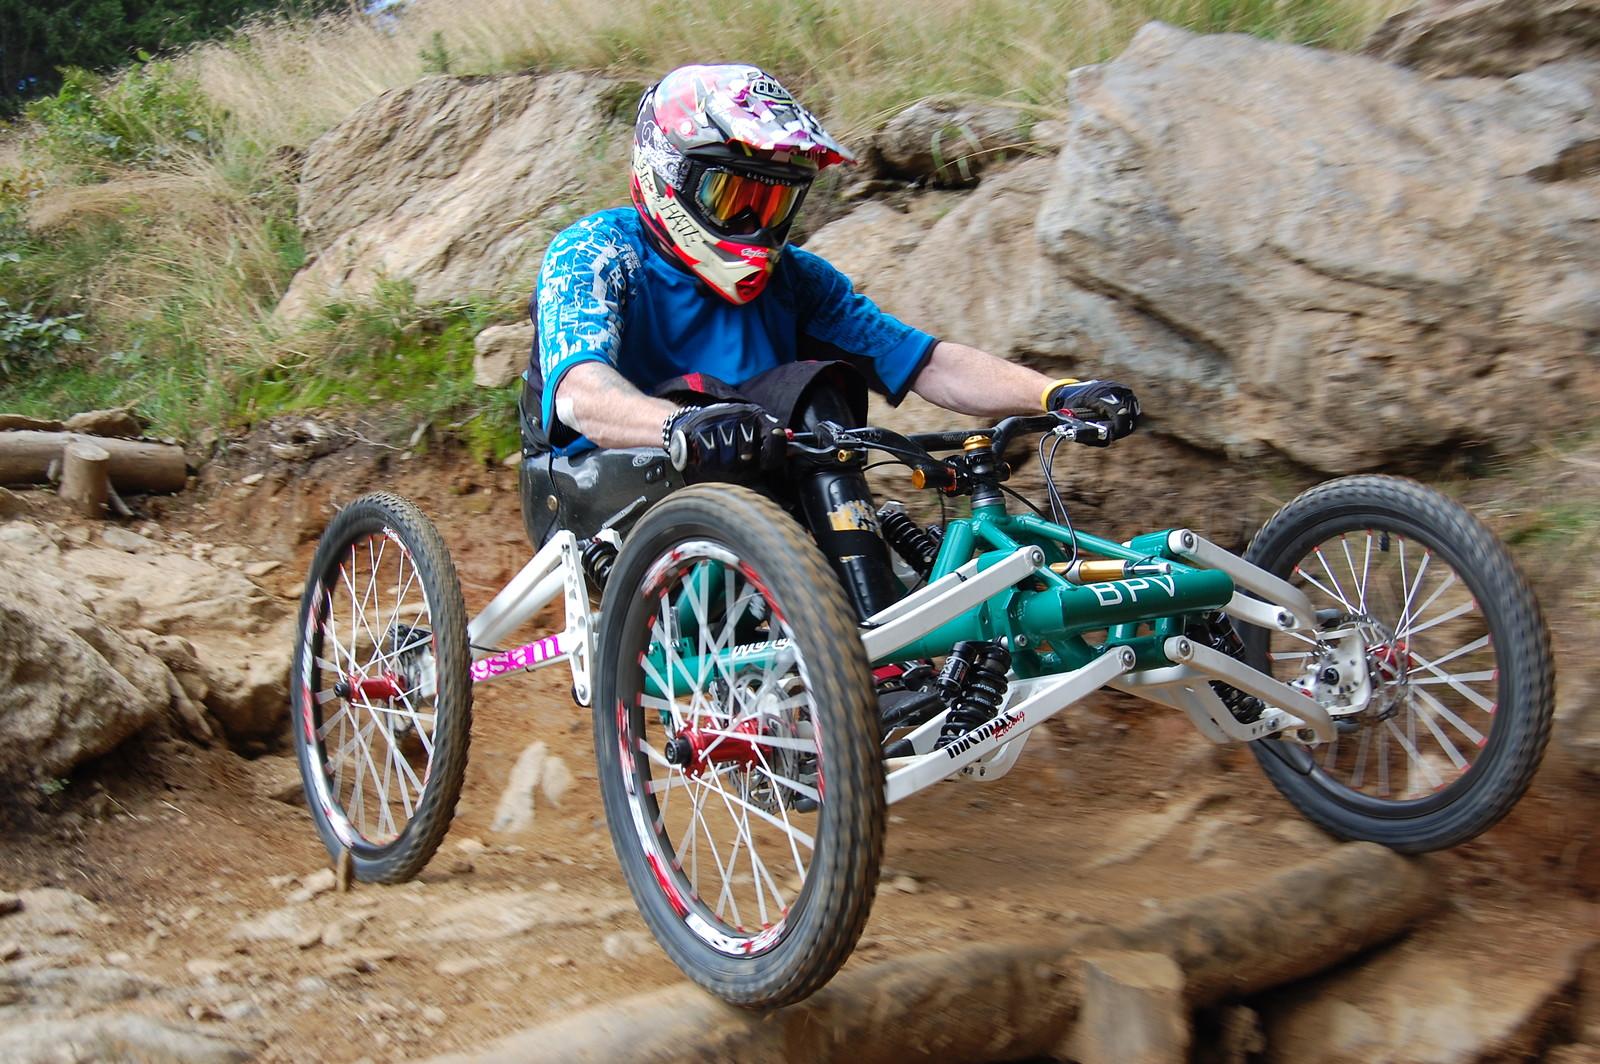 DSC 0049 - wozikmajkl83 - Mountain Biking Pictures - Vital MTB